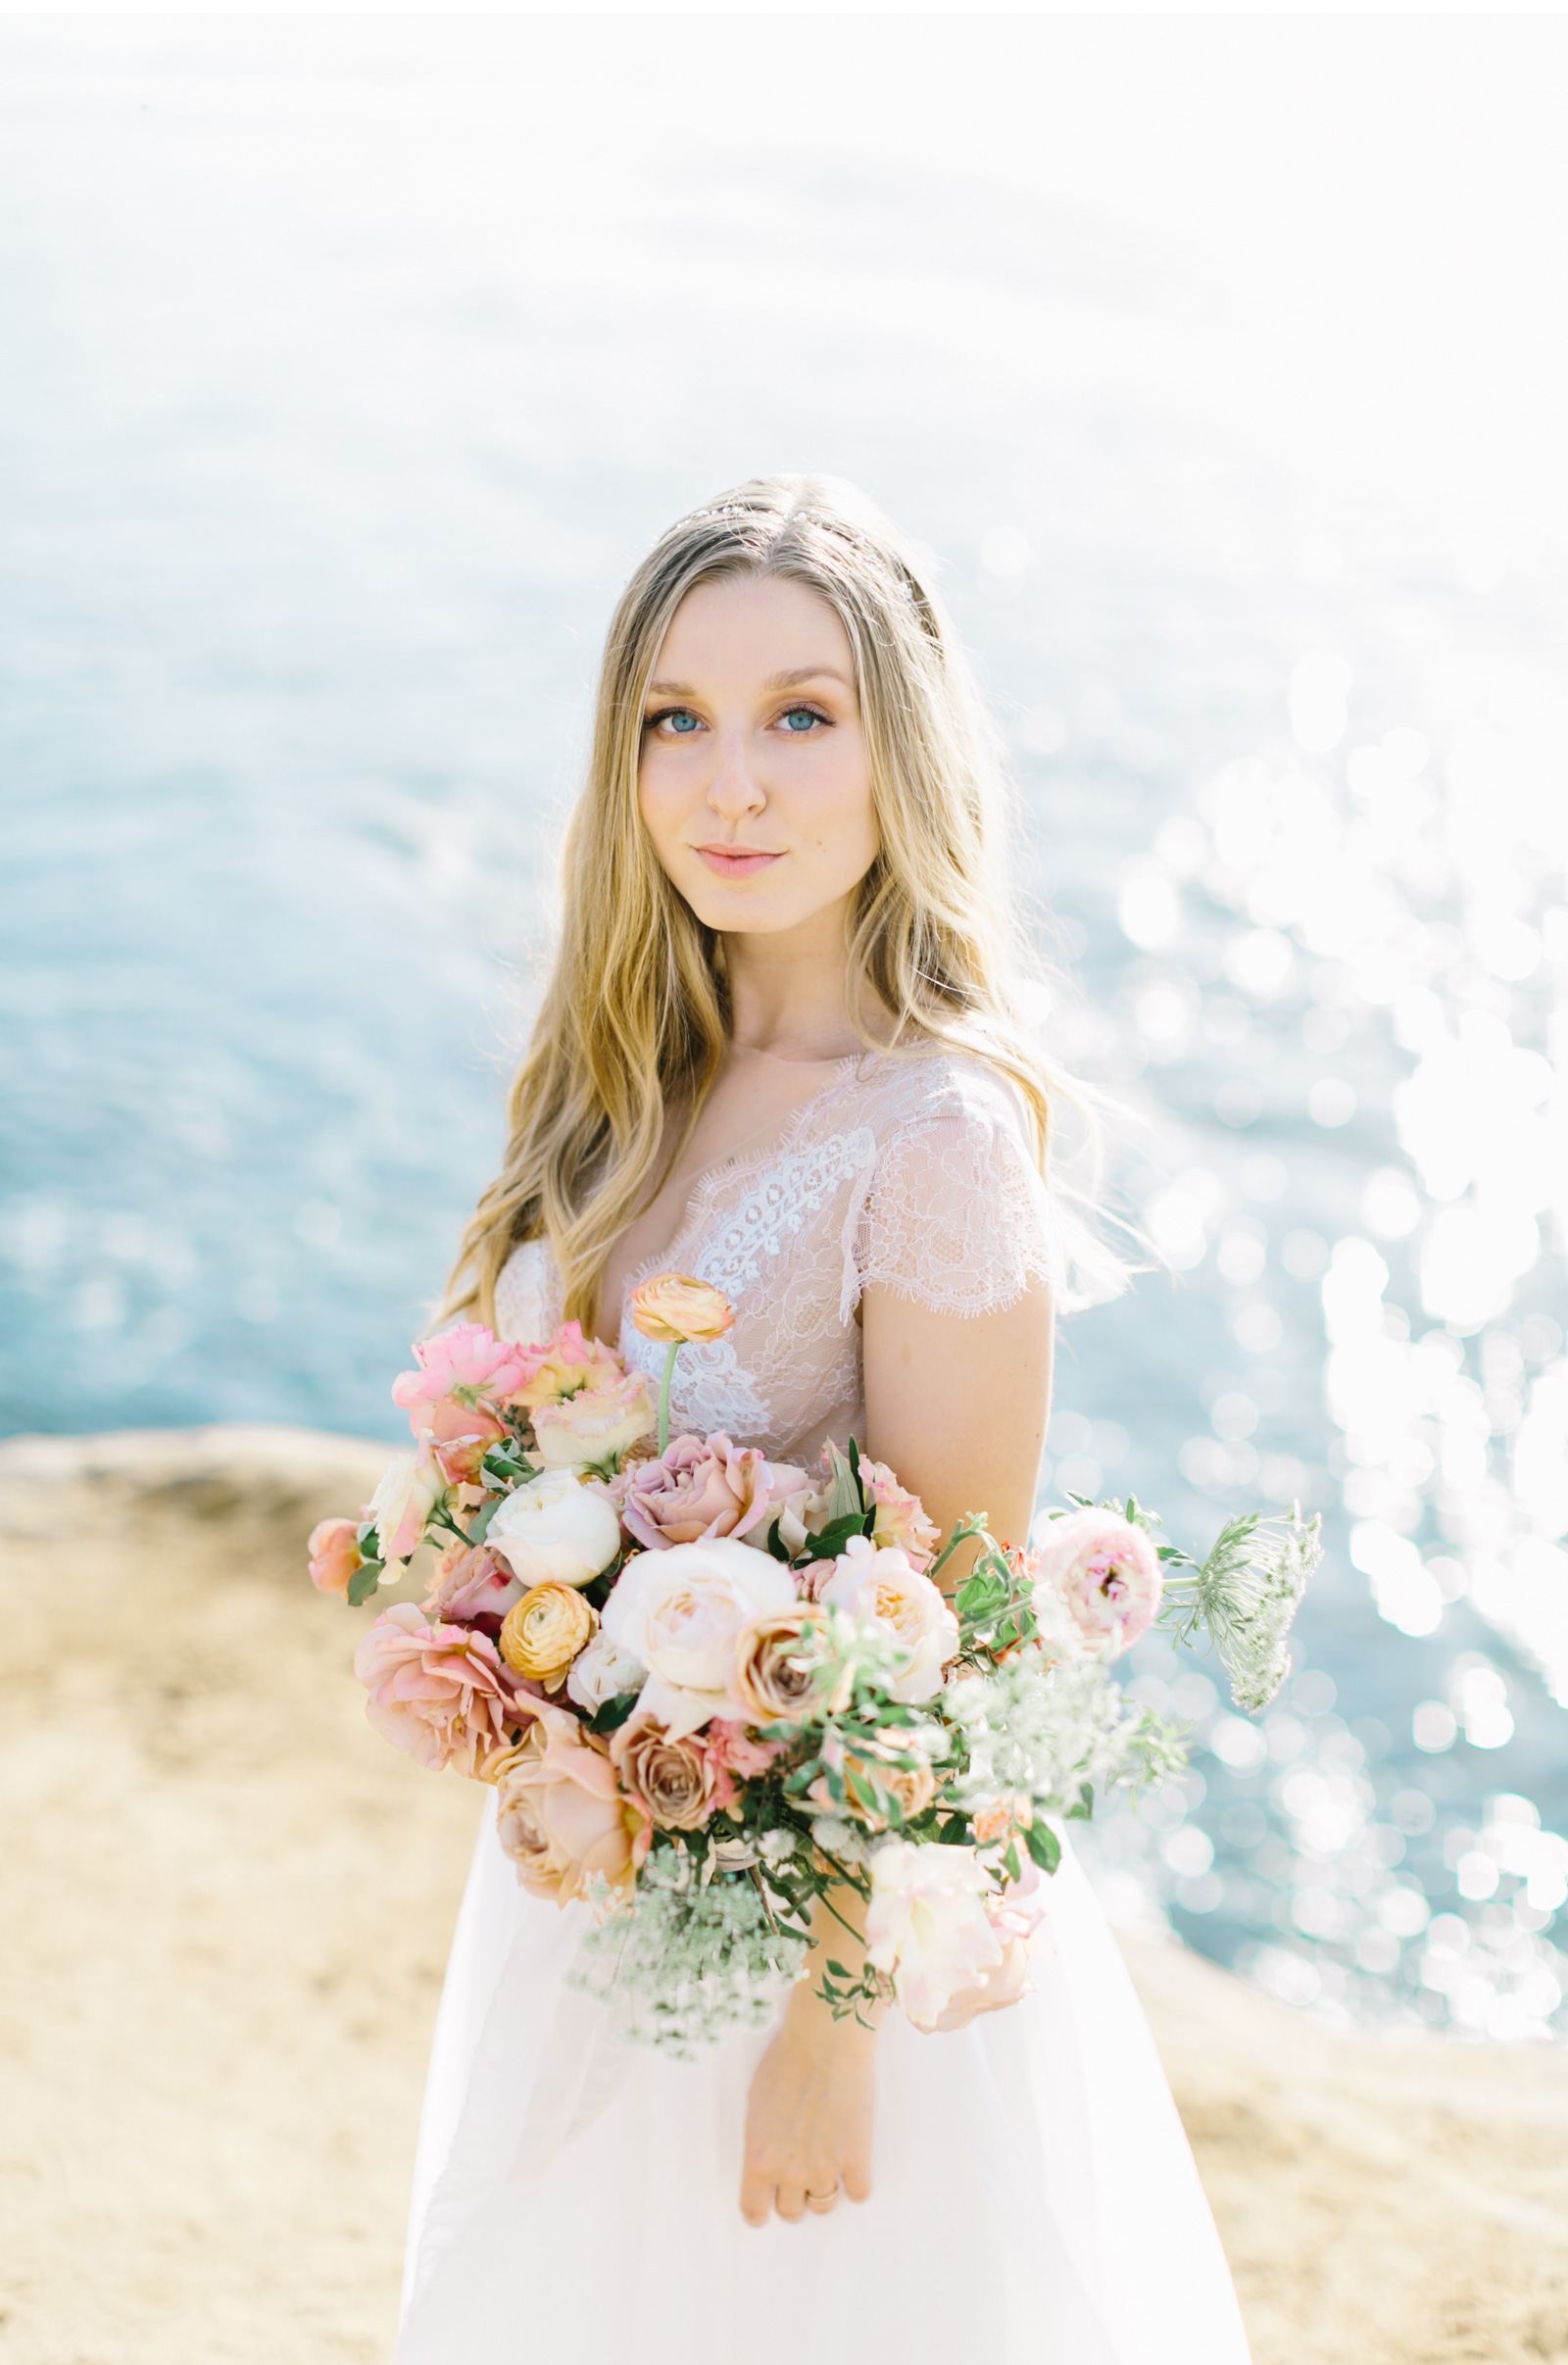 Style-Me-Pretty-California-Beach-Wedding-Natalie-Schutt-Photography_08.jpg